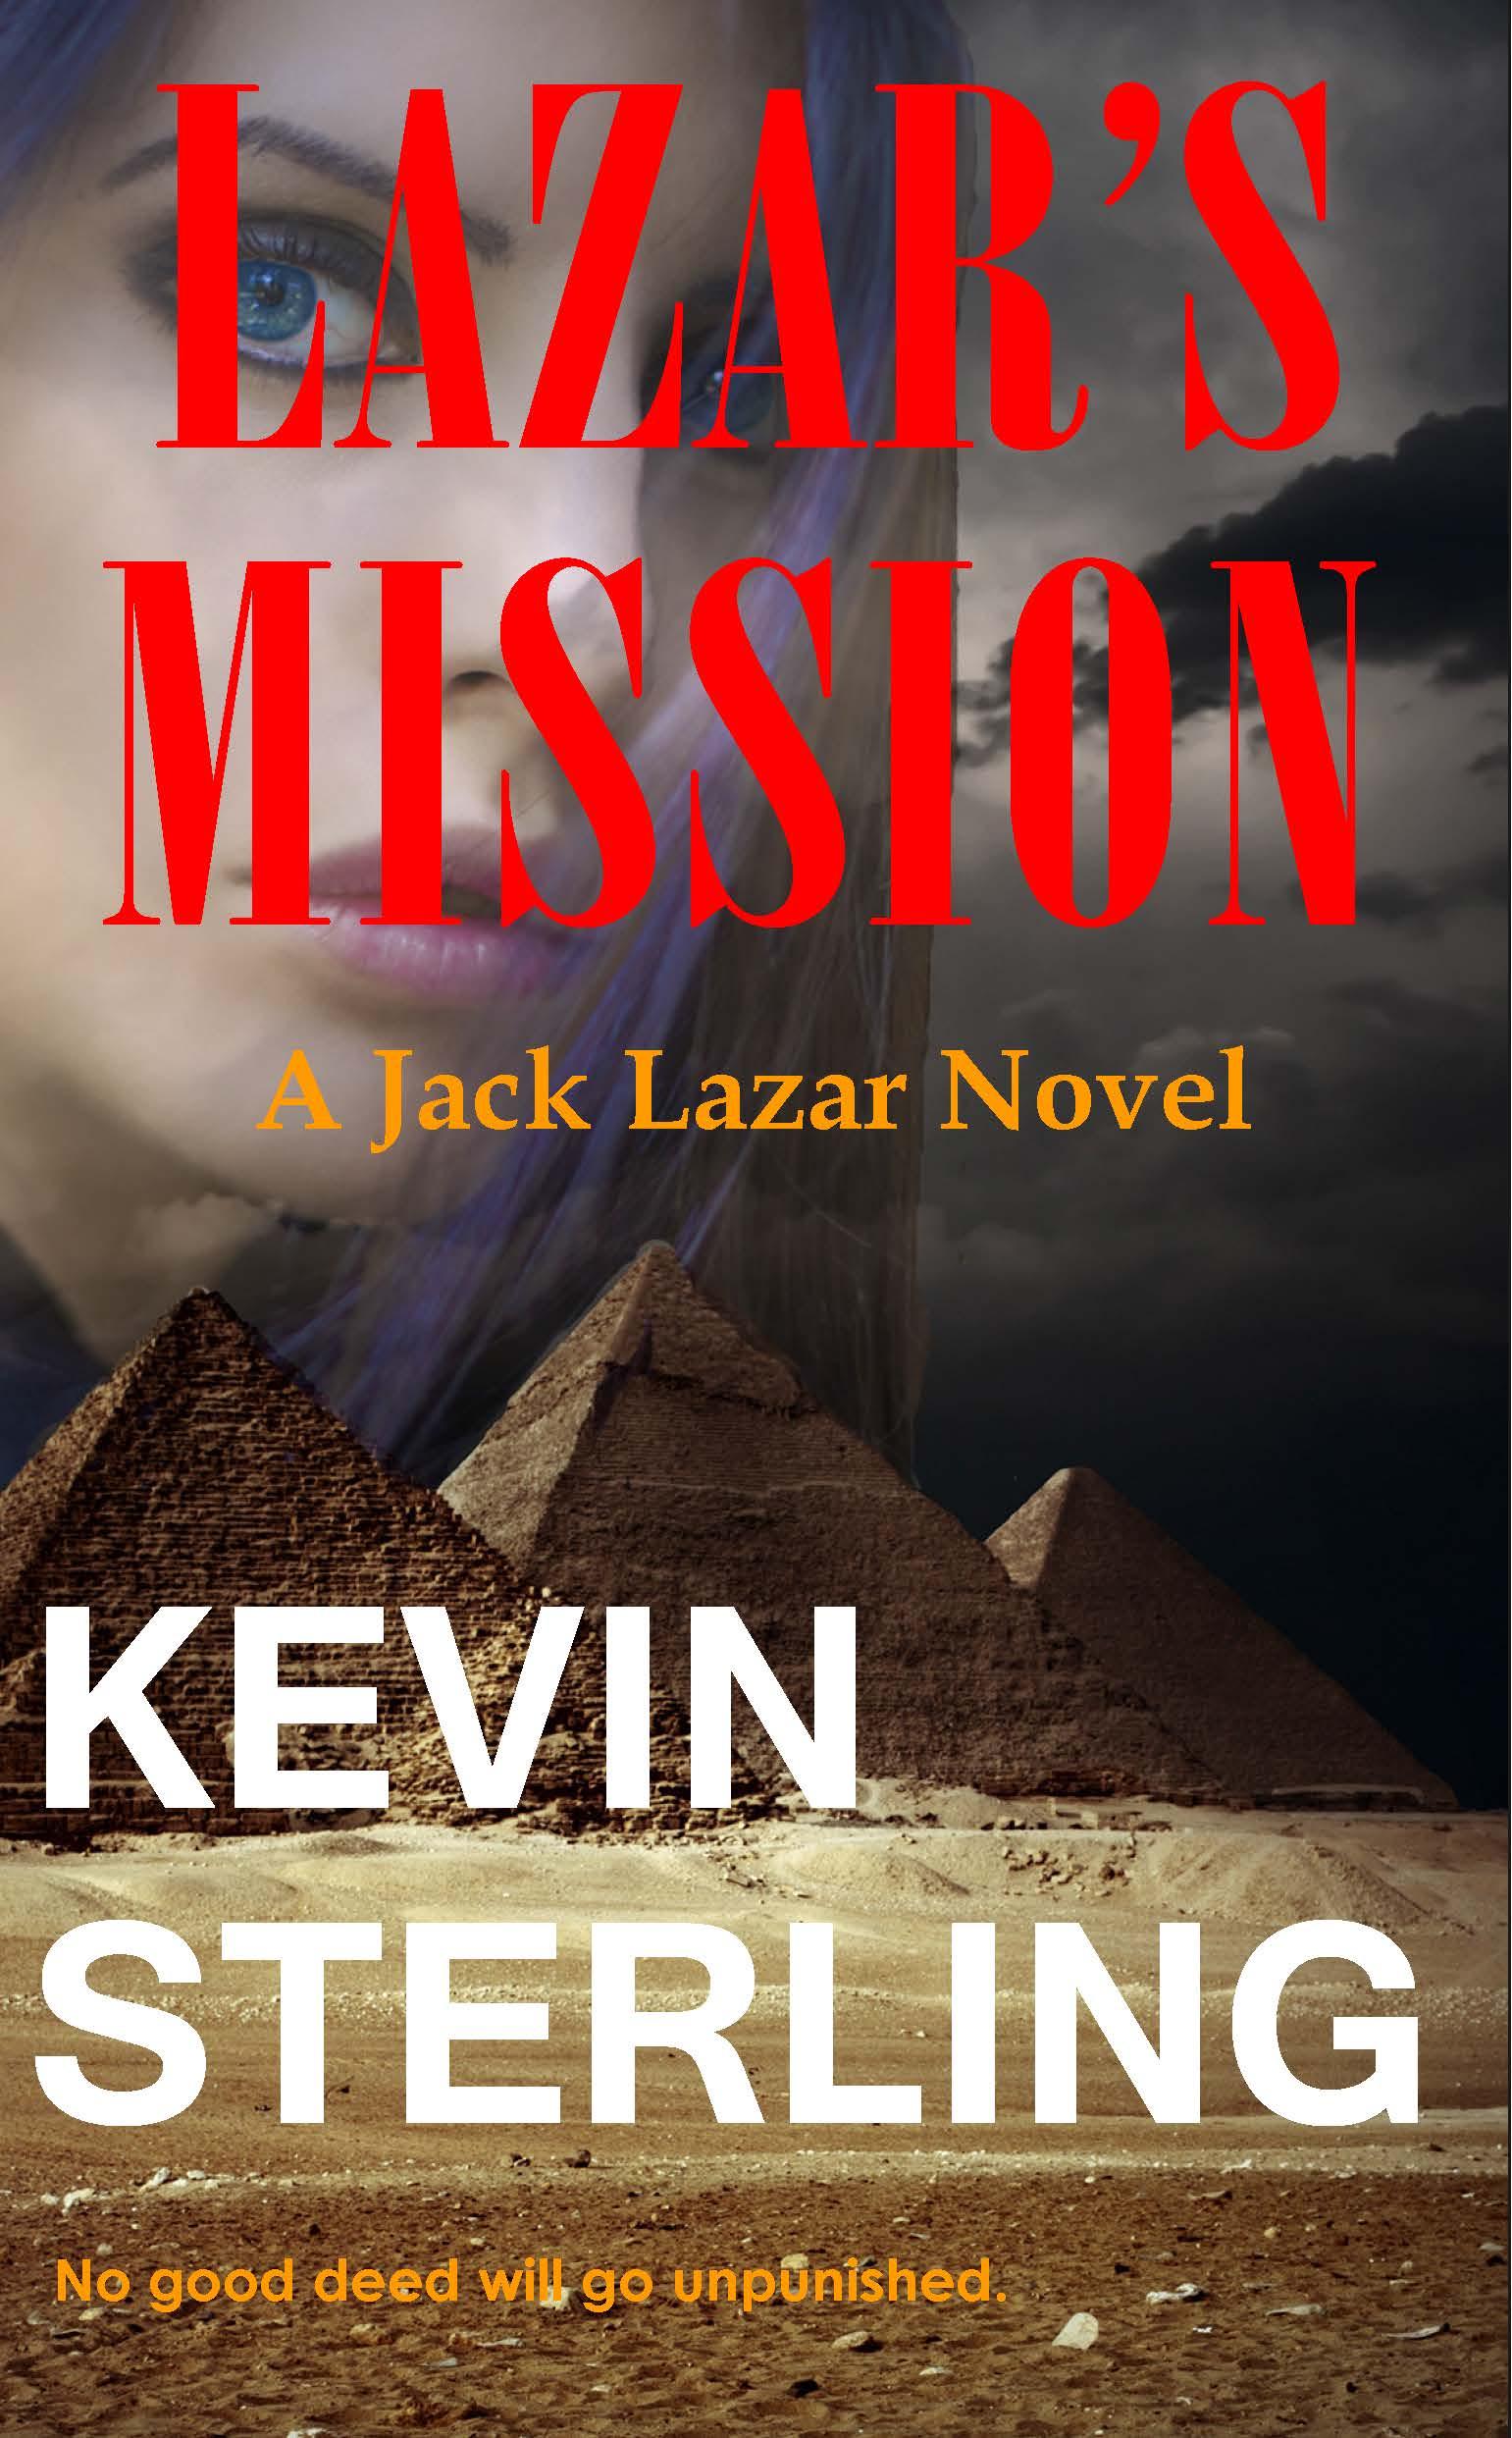 Lazar's Mission